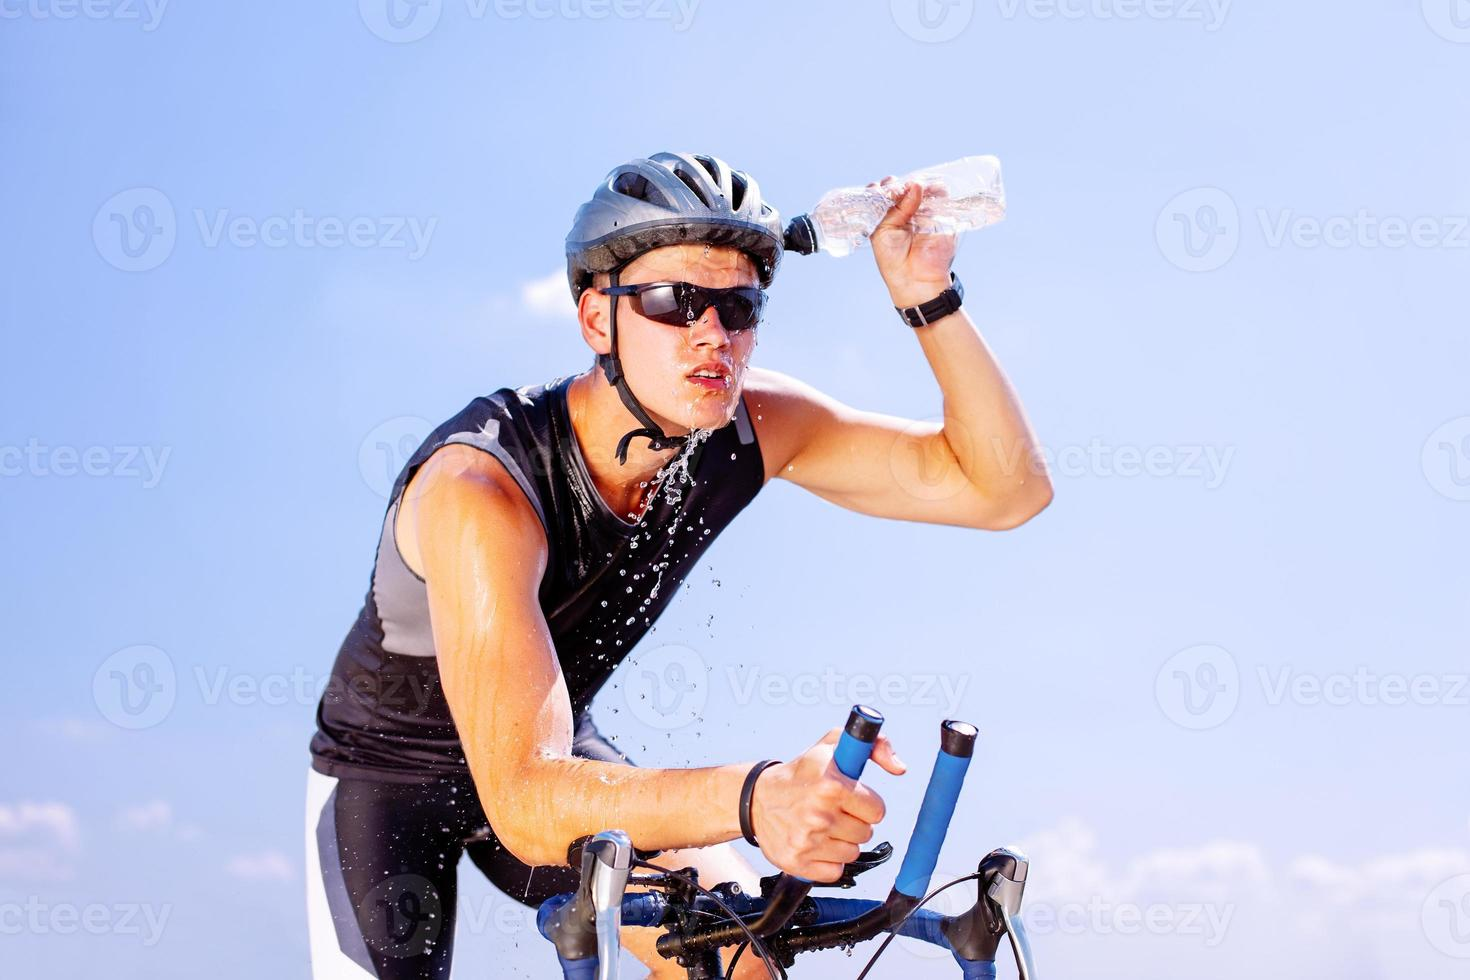 triatleta, andar de bicicleta foto